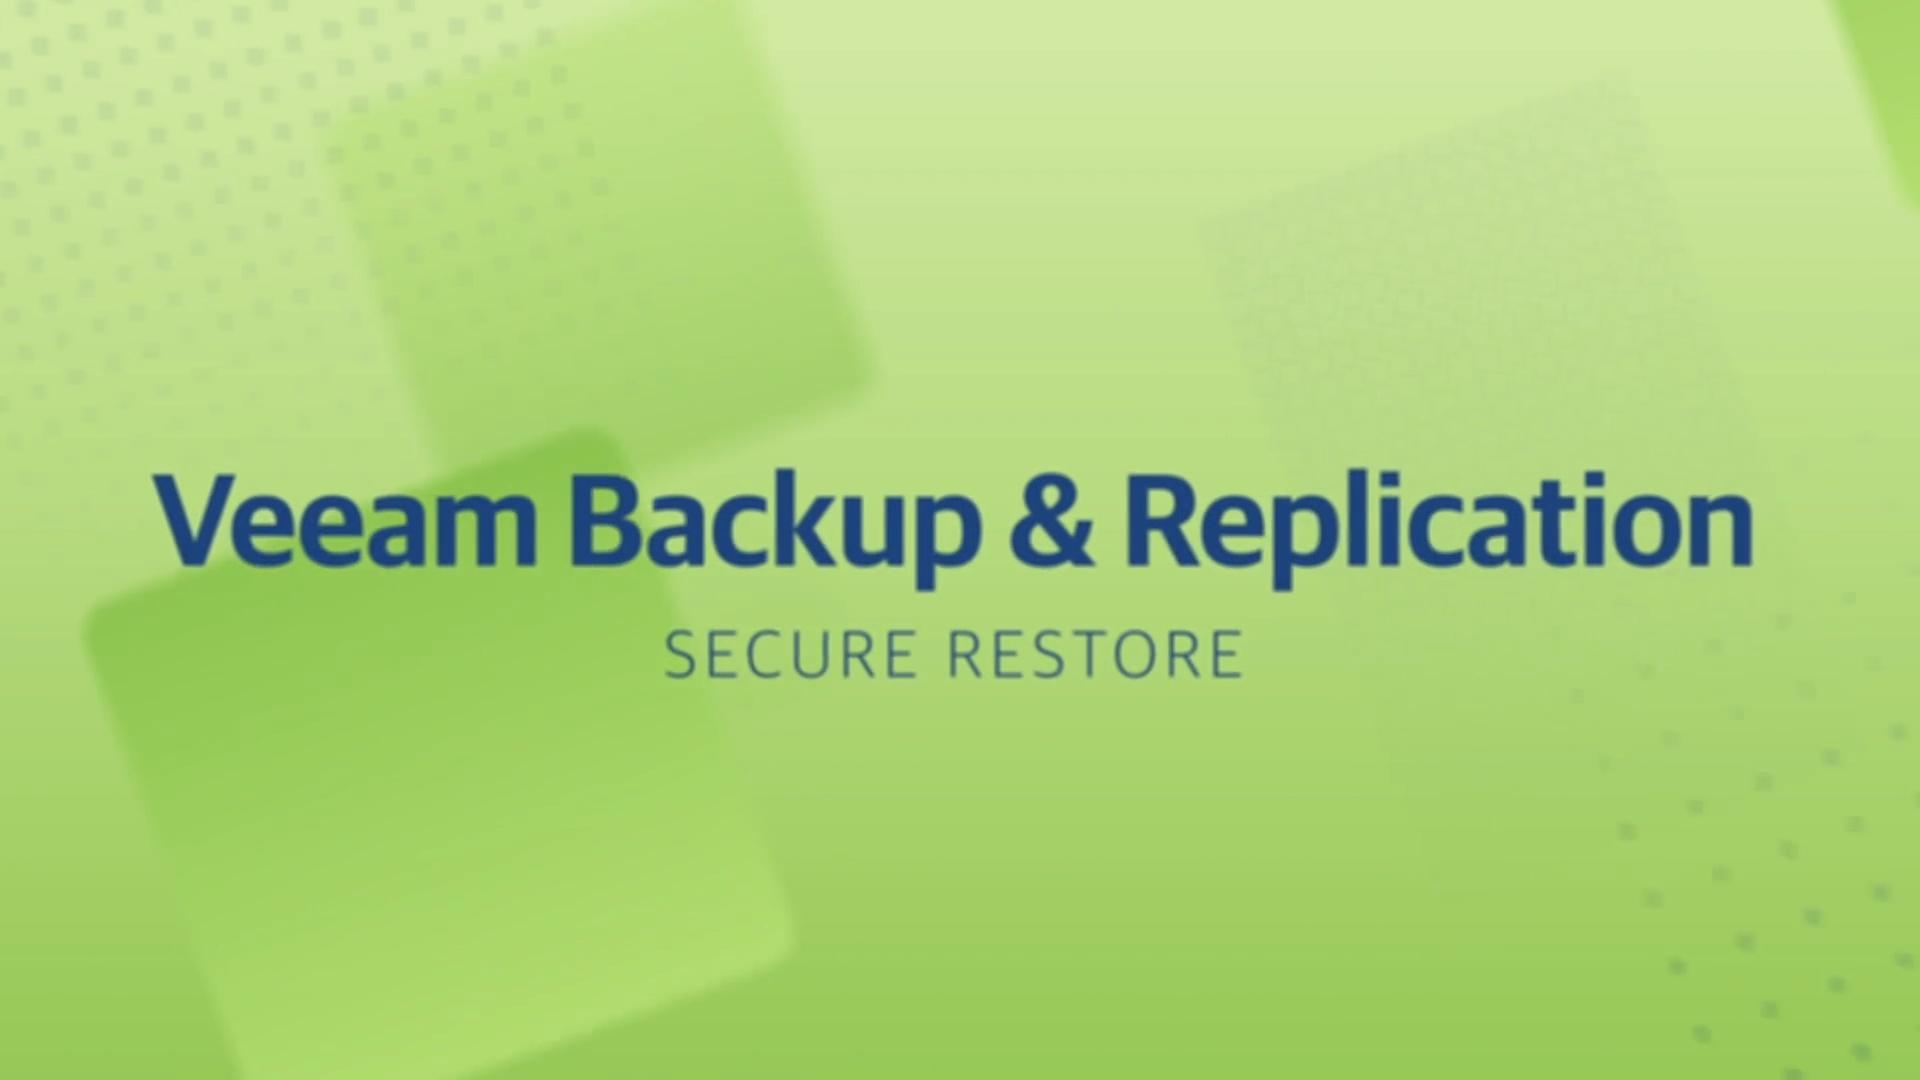 Product launch v11 - VBR - Secure Restore